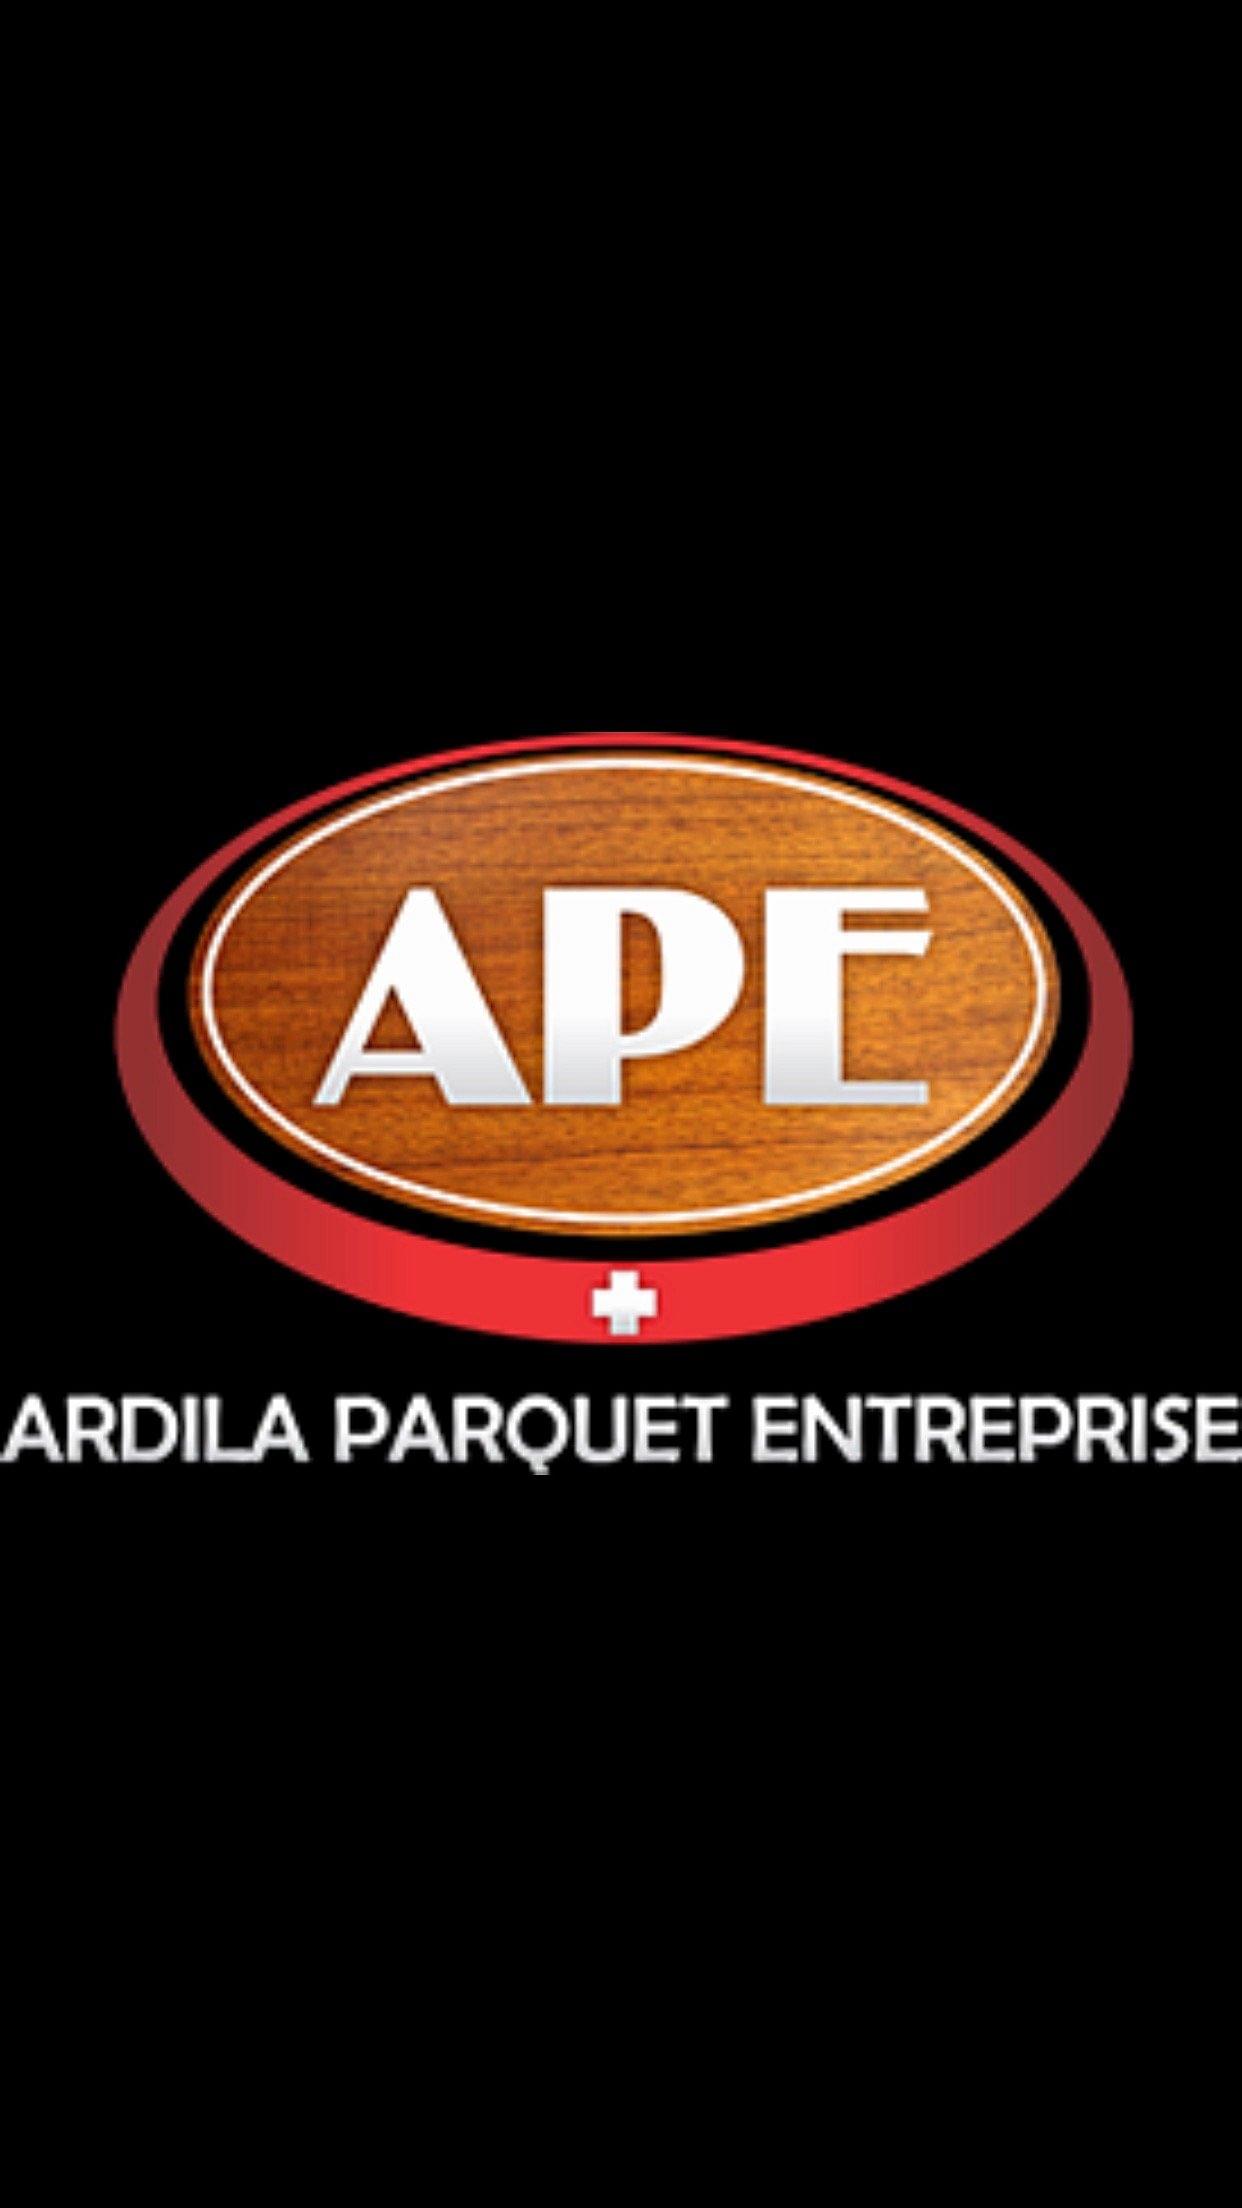 Ardila Parquet Entreprise